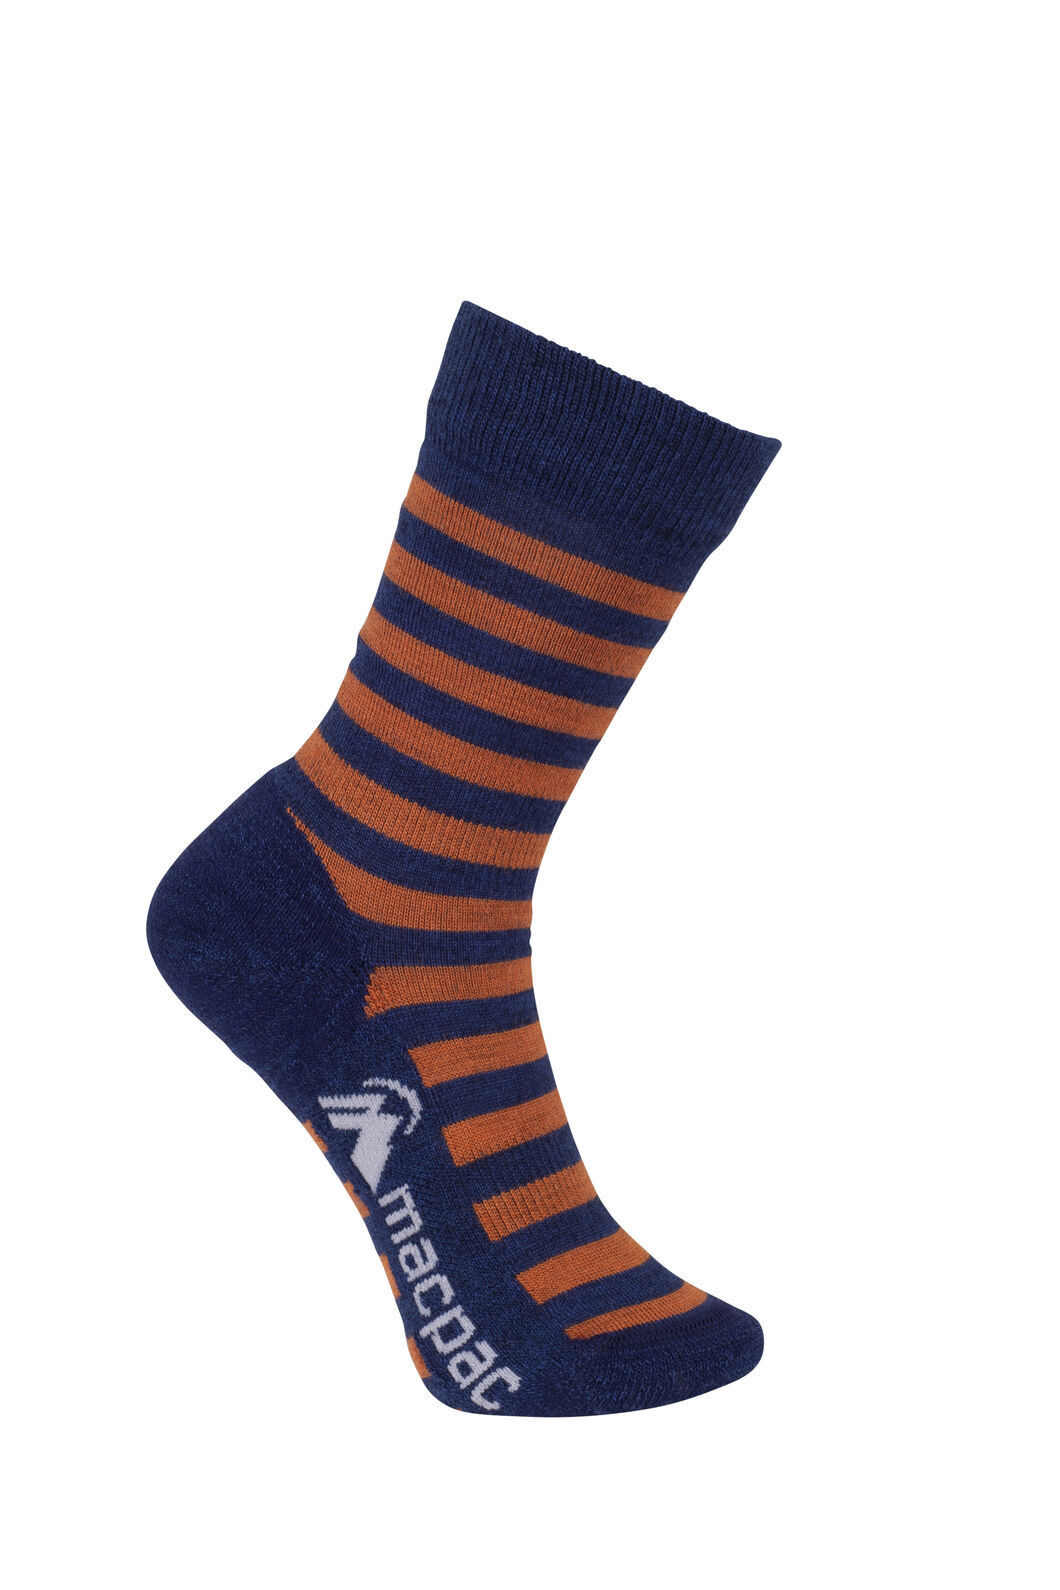 Macpac Footprint Socks Kids', Medieval/Puffins Bill, hi-res